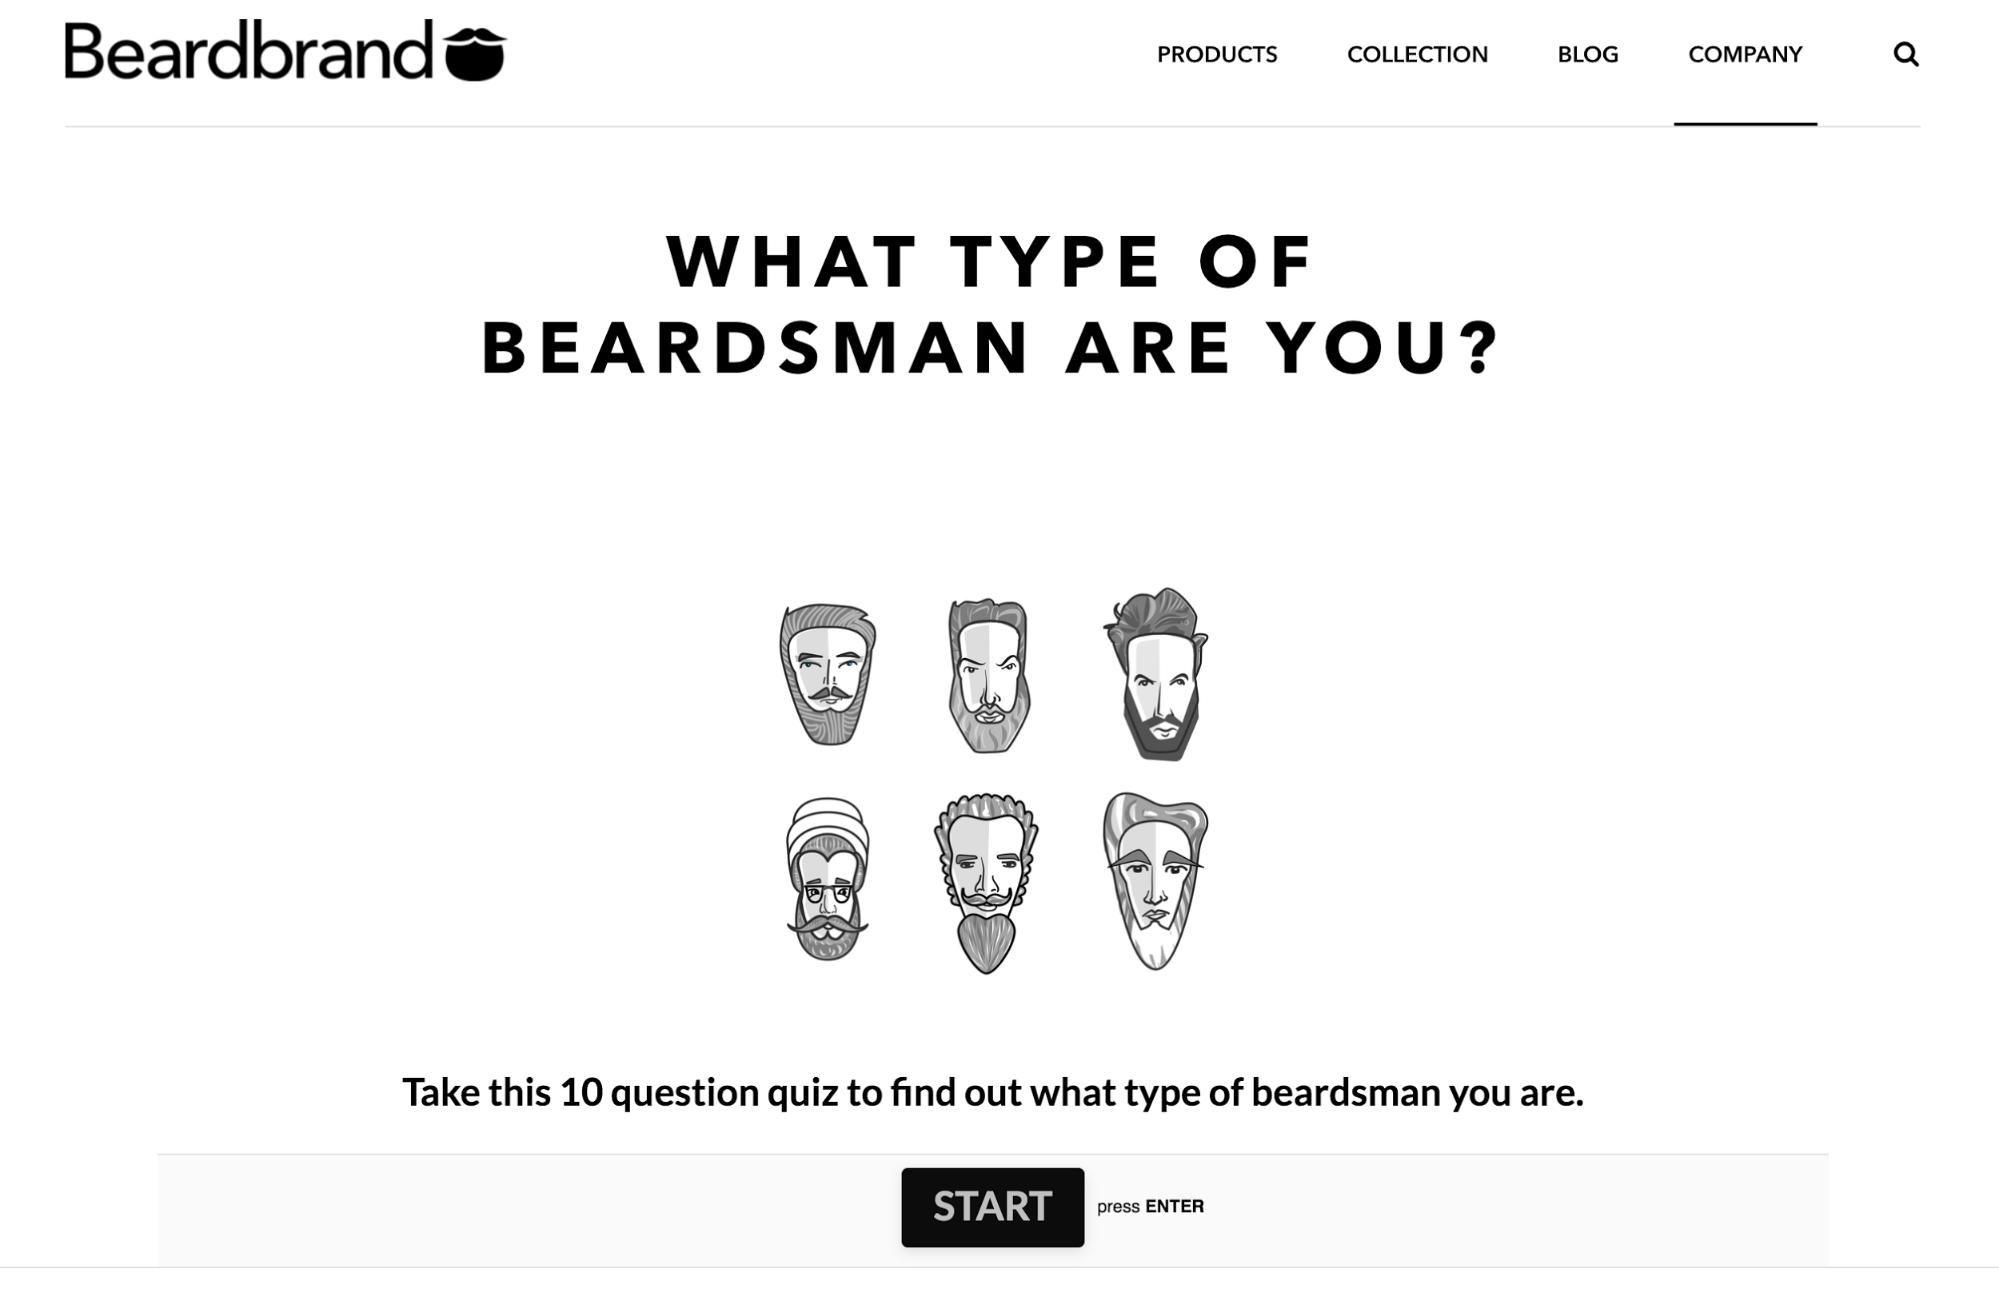 Screenshot showing a quiz page on beardbrand